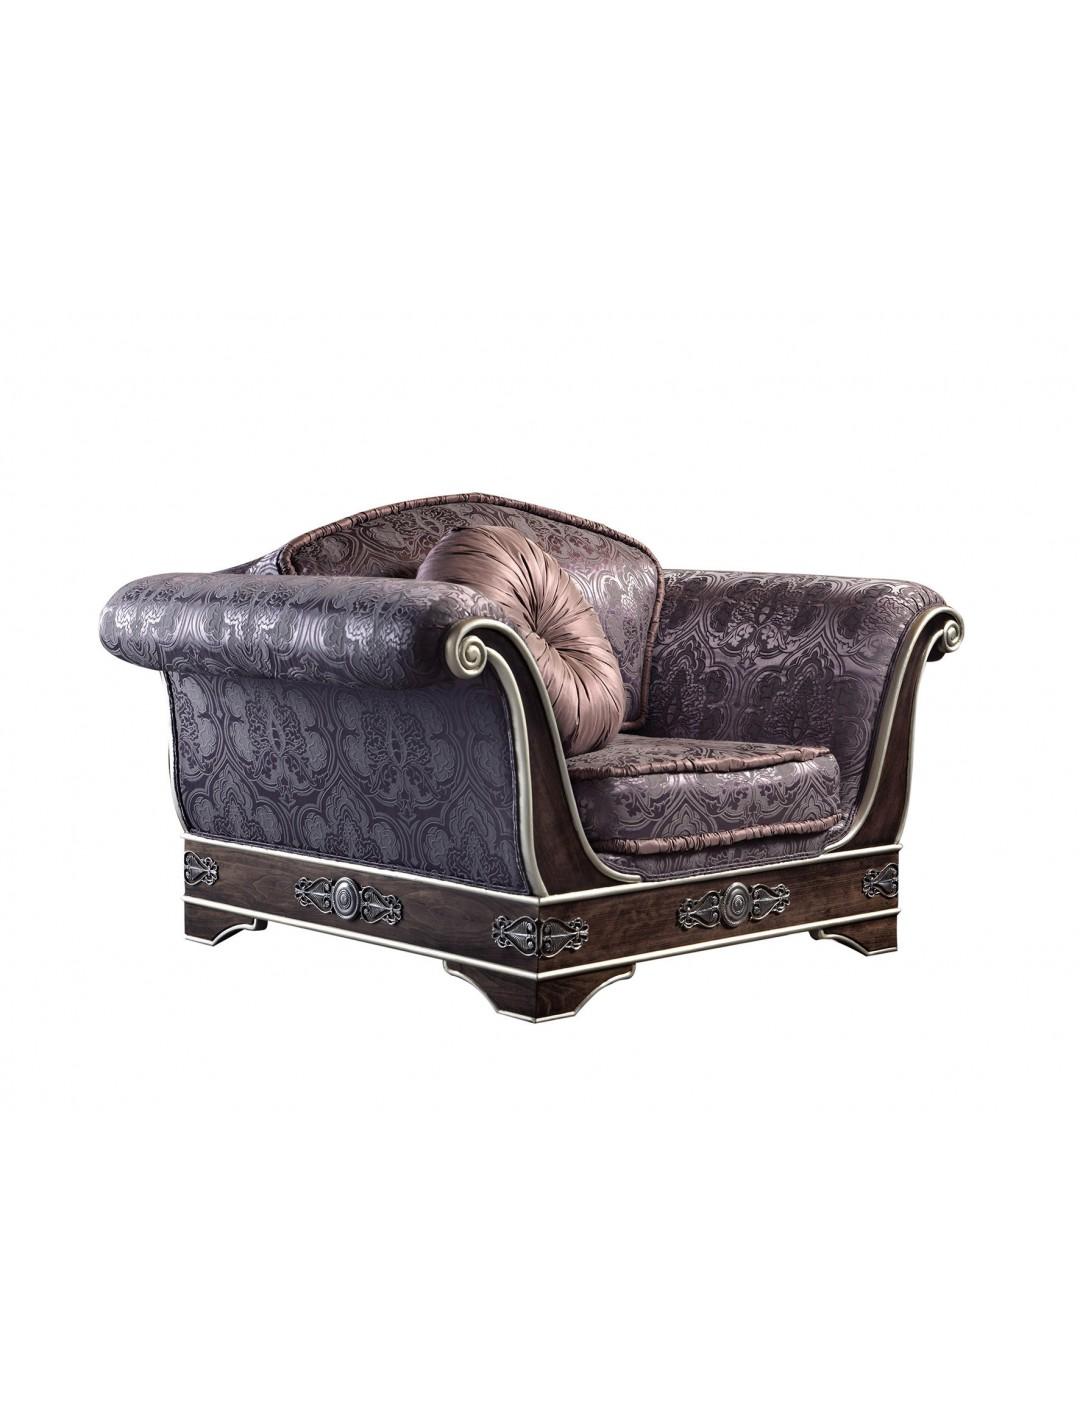 ROYAL 1 SEAT SOFA, FINISH: 50 D. CUSHION, BRASS DETAILS, C.O.M.